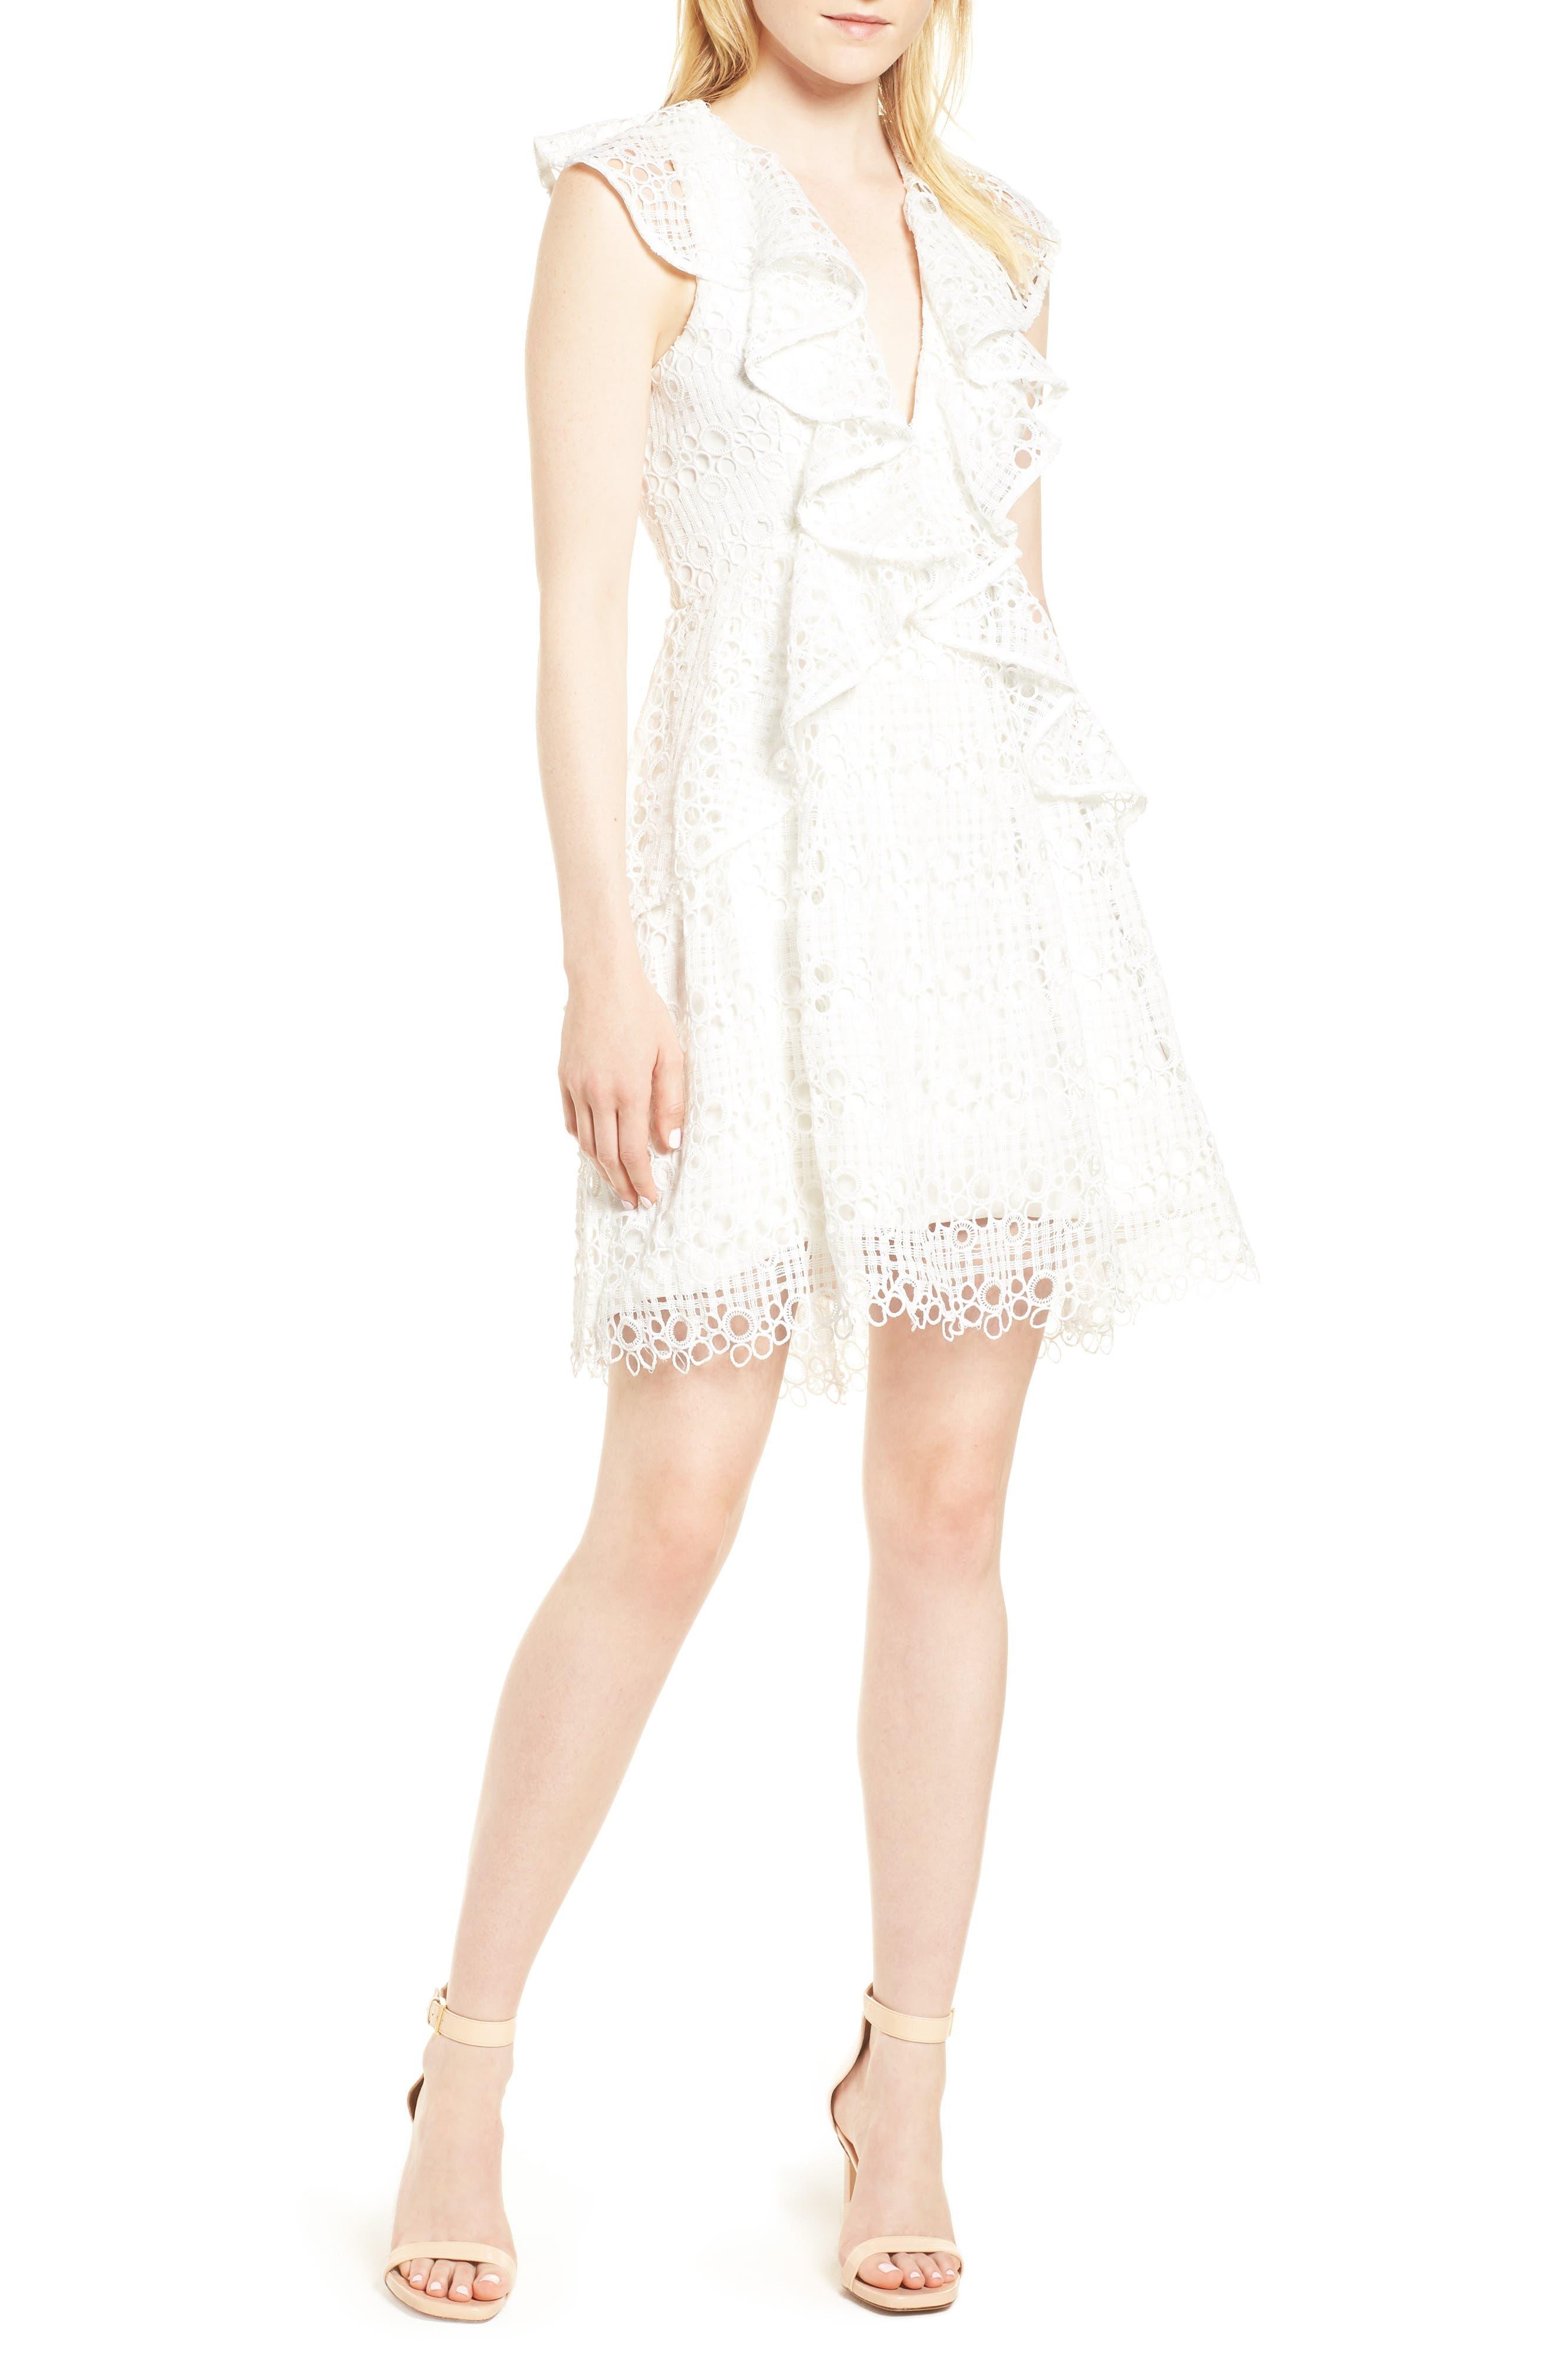 Interlude Dress,                             Main thumbnail 1, color,                             100